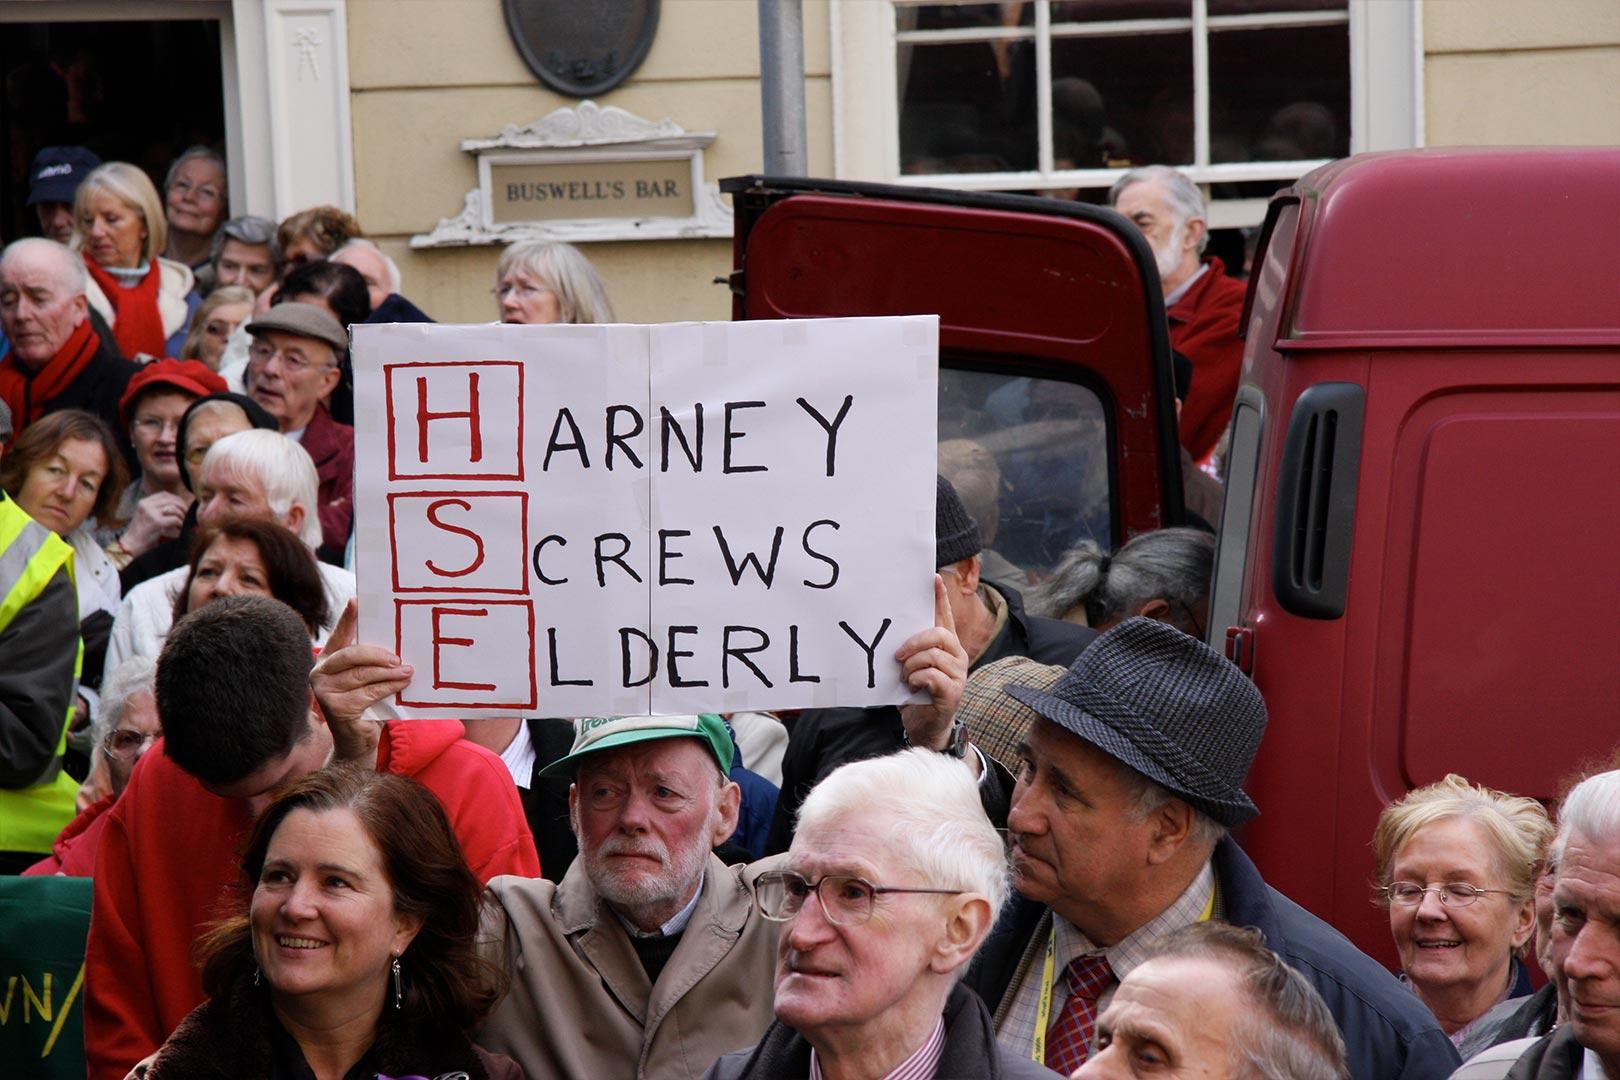 HSE Harney Screws Elderly Medical card protest Augustine o Donoghue